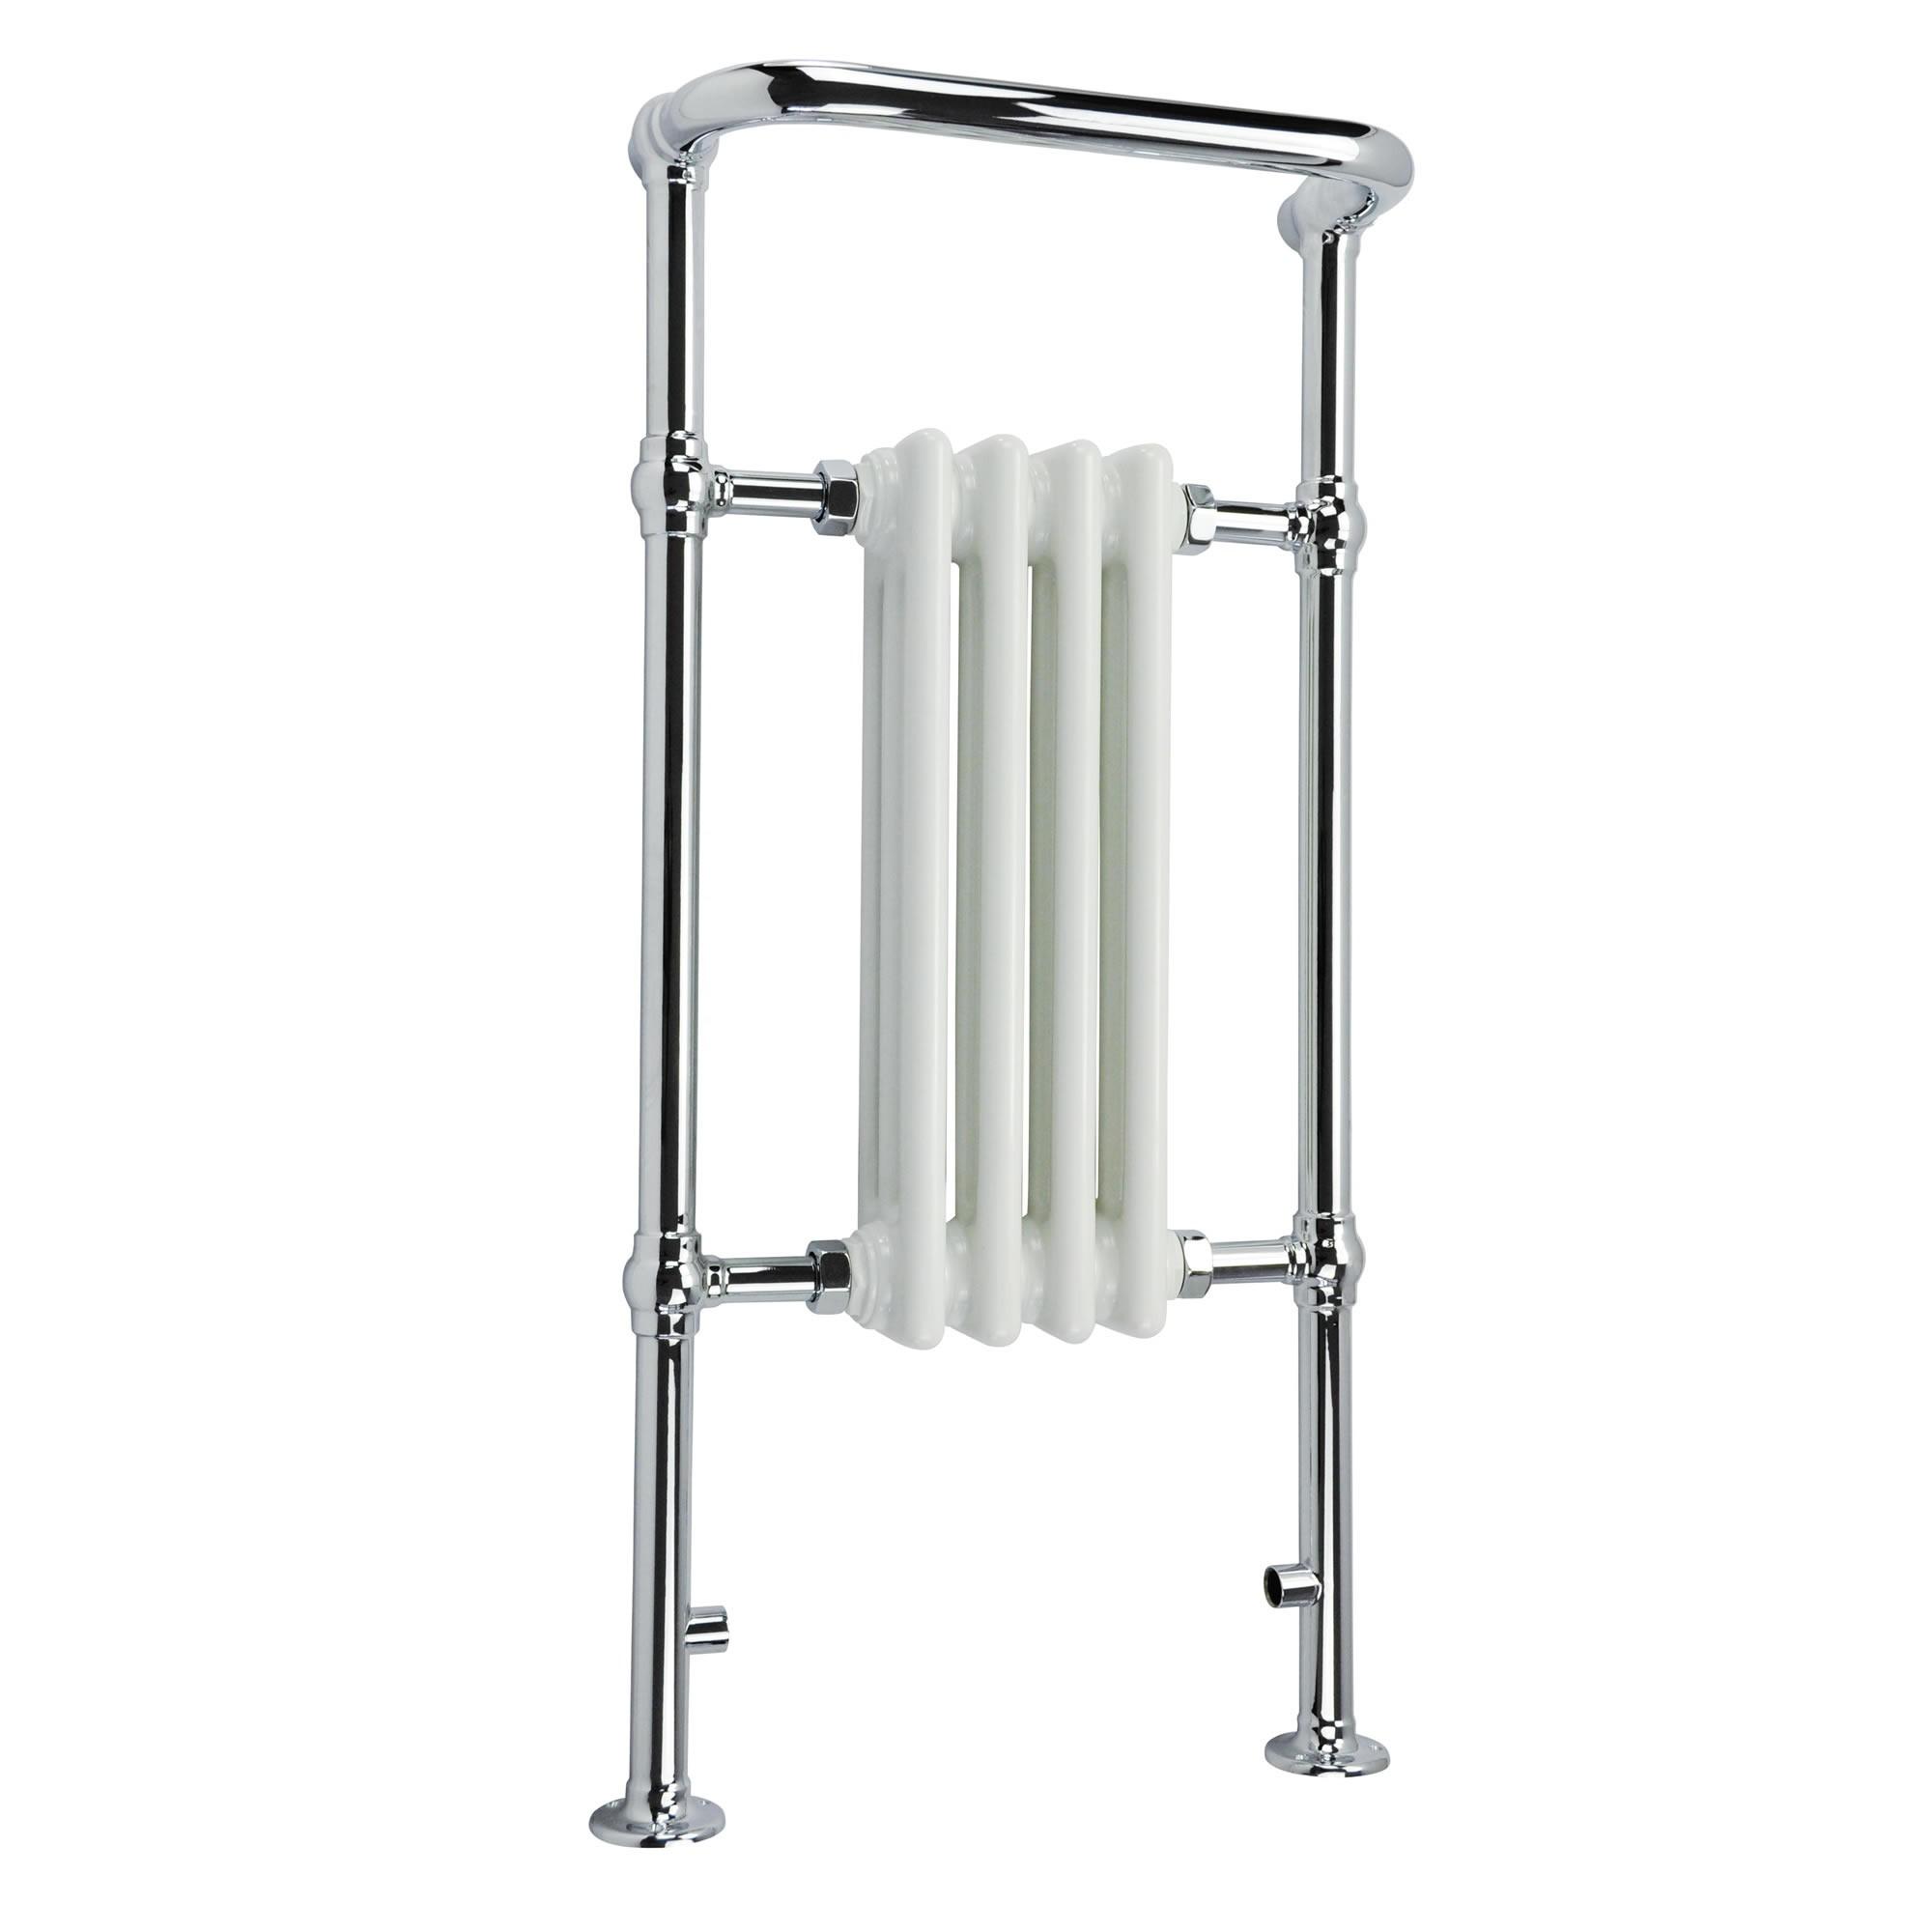 Traditional Heated Towel Rail Column Radiator White: HEATED TRADITIONAL CHROME TOWEL RAIL RADIATOR RAD 420W